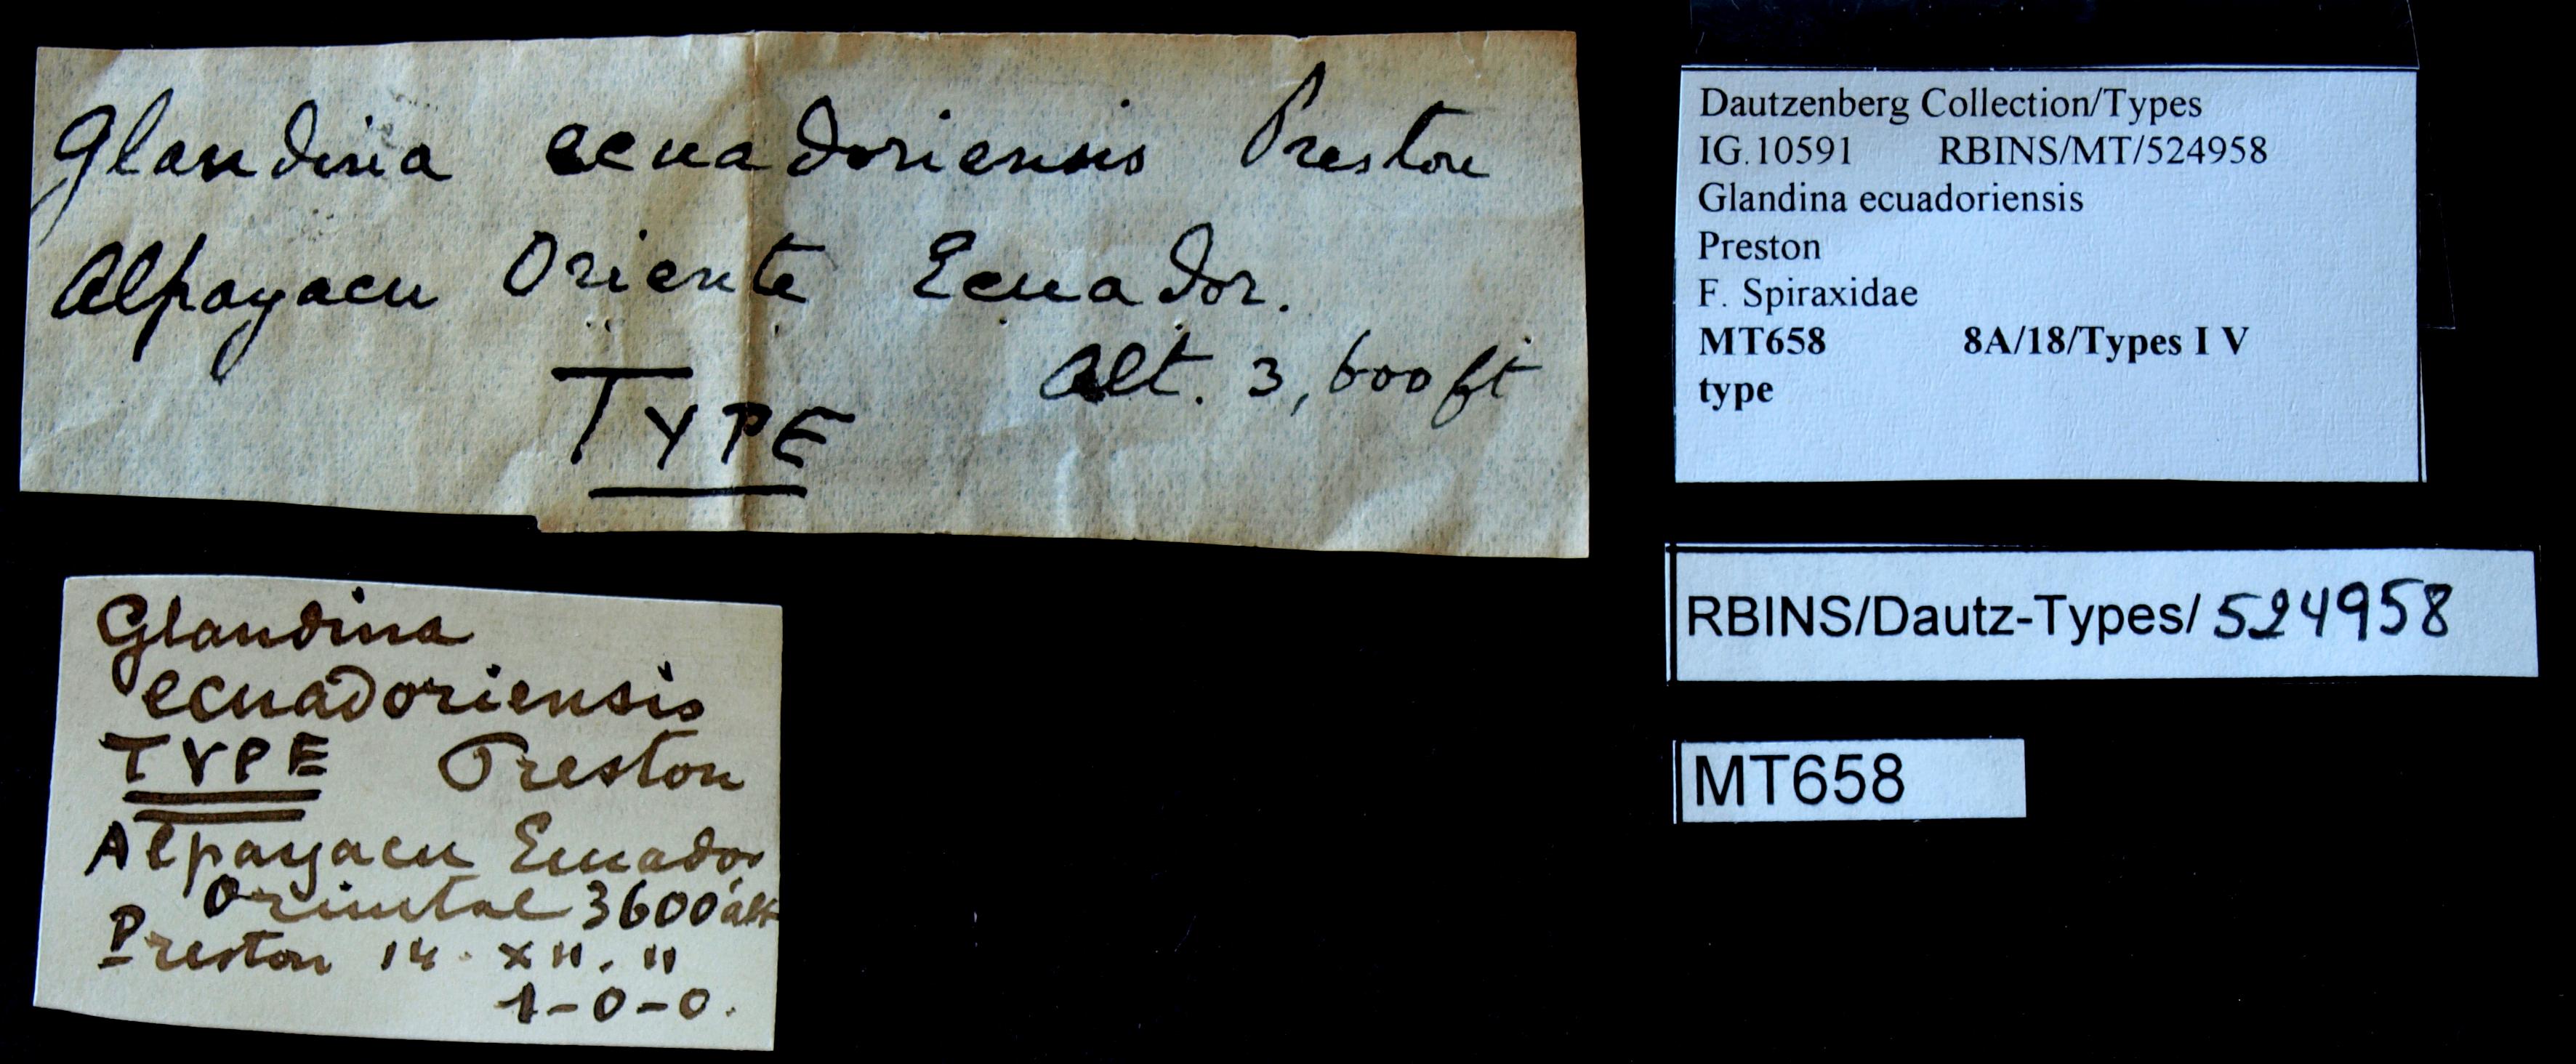 BE-RBINS-INV MT 658 Glandina ecuadoriensis Type Lb.jpg